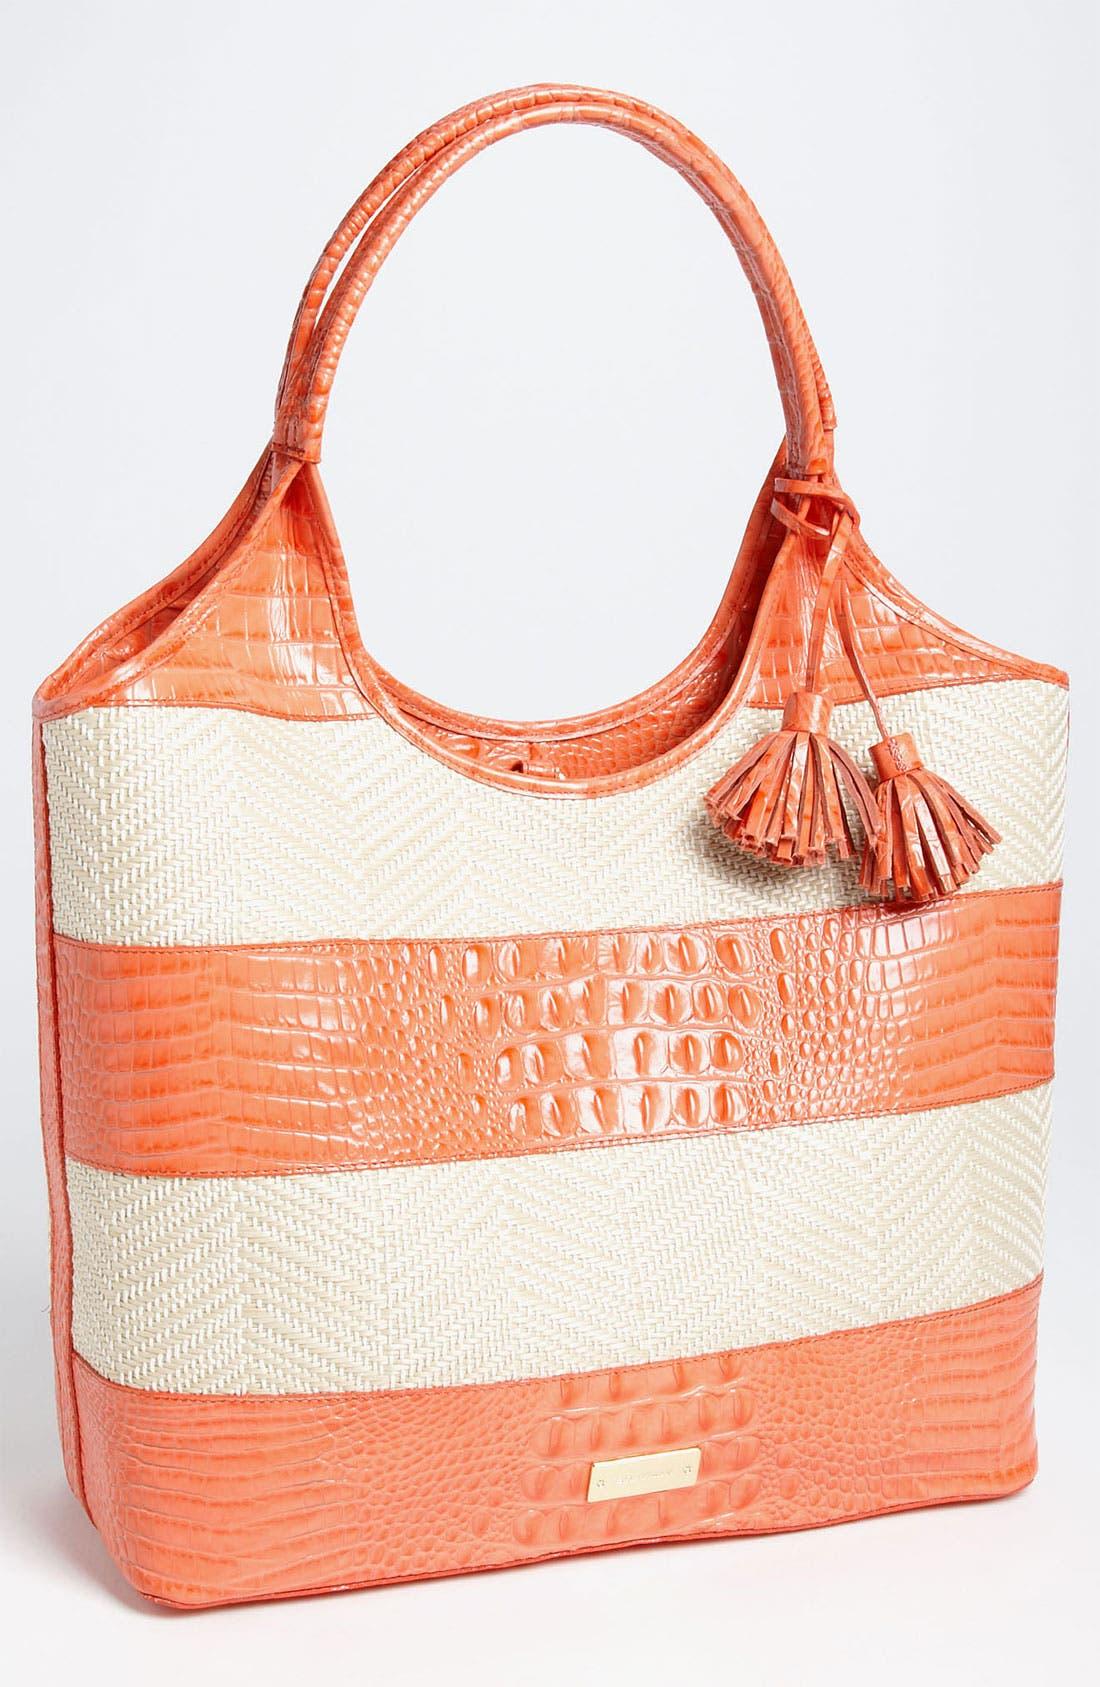 Main Image - Brahmin 'Vineyard' Leather & Raffia Shopper